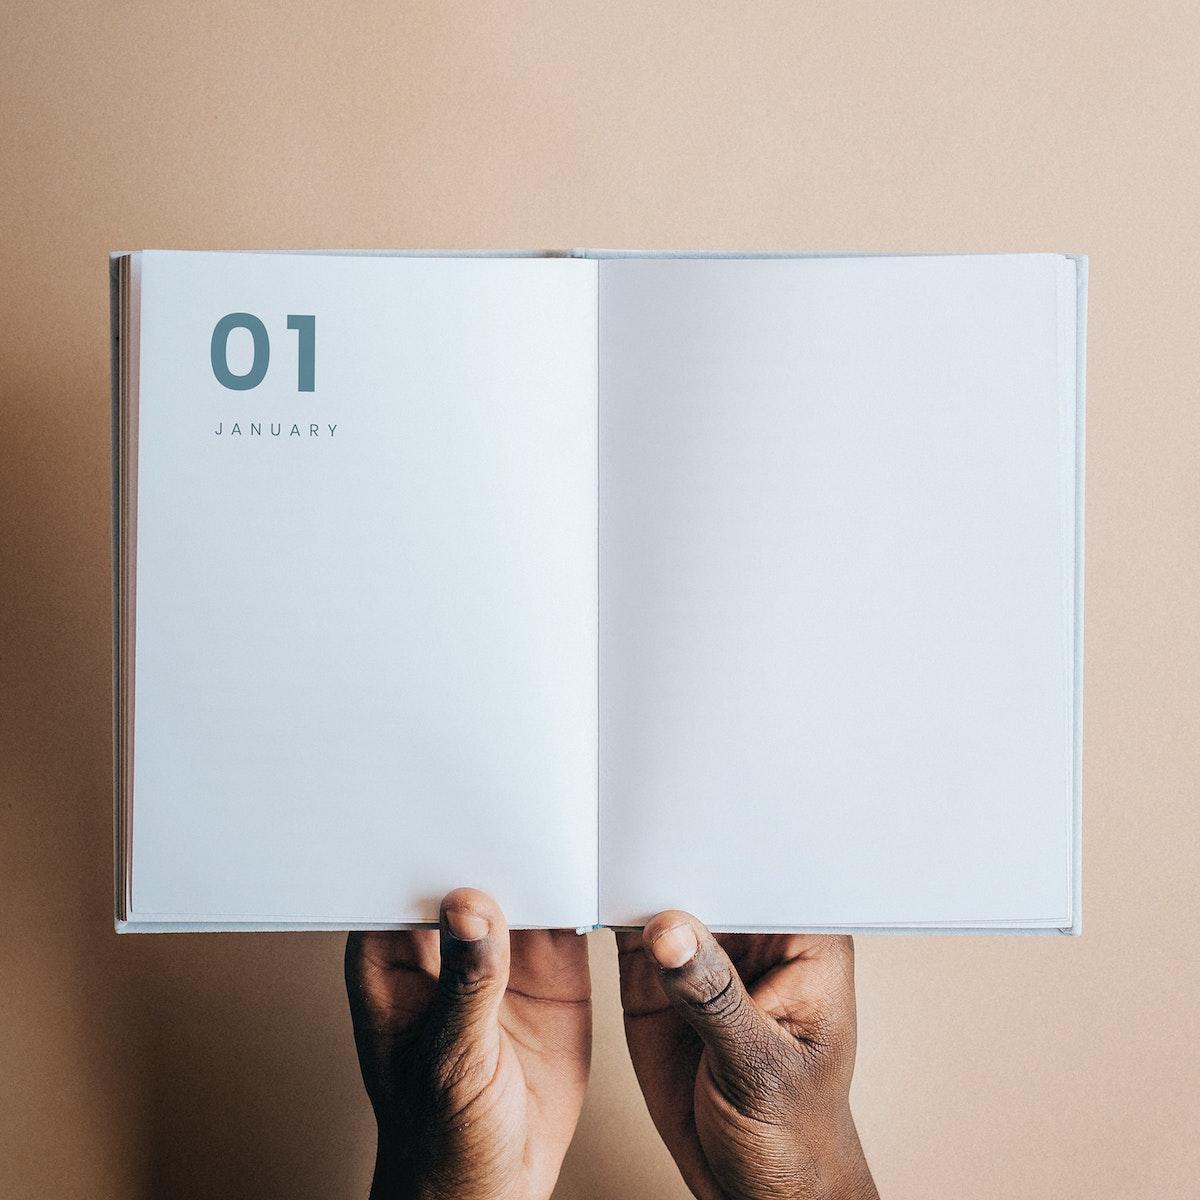 Black man holding a book planner mockup